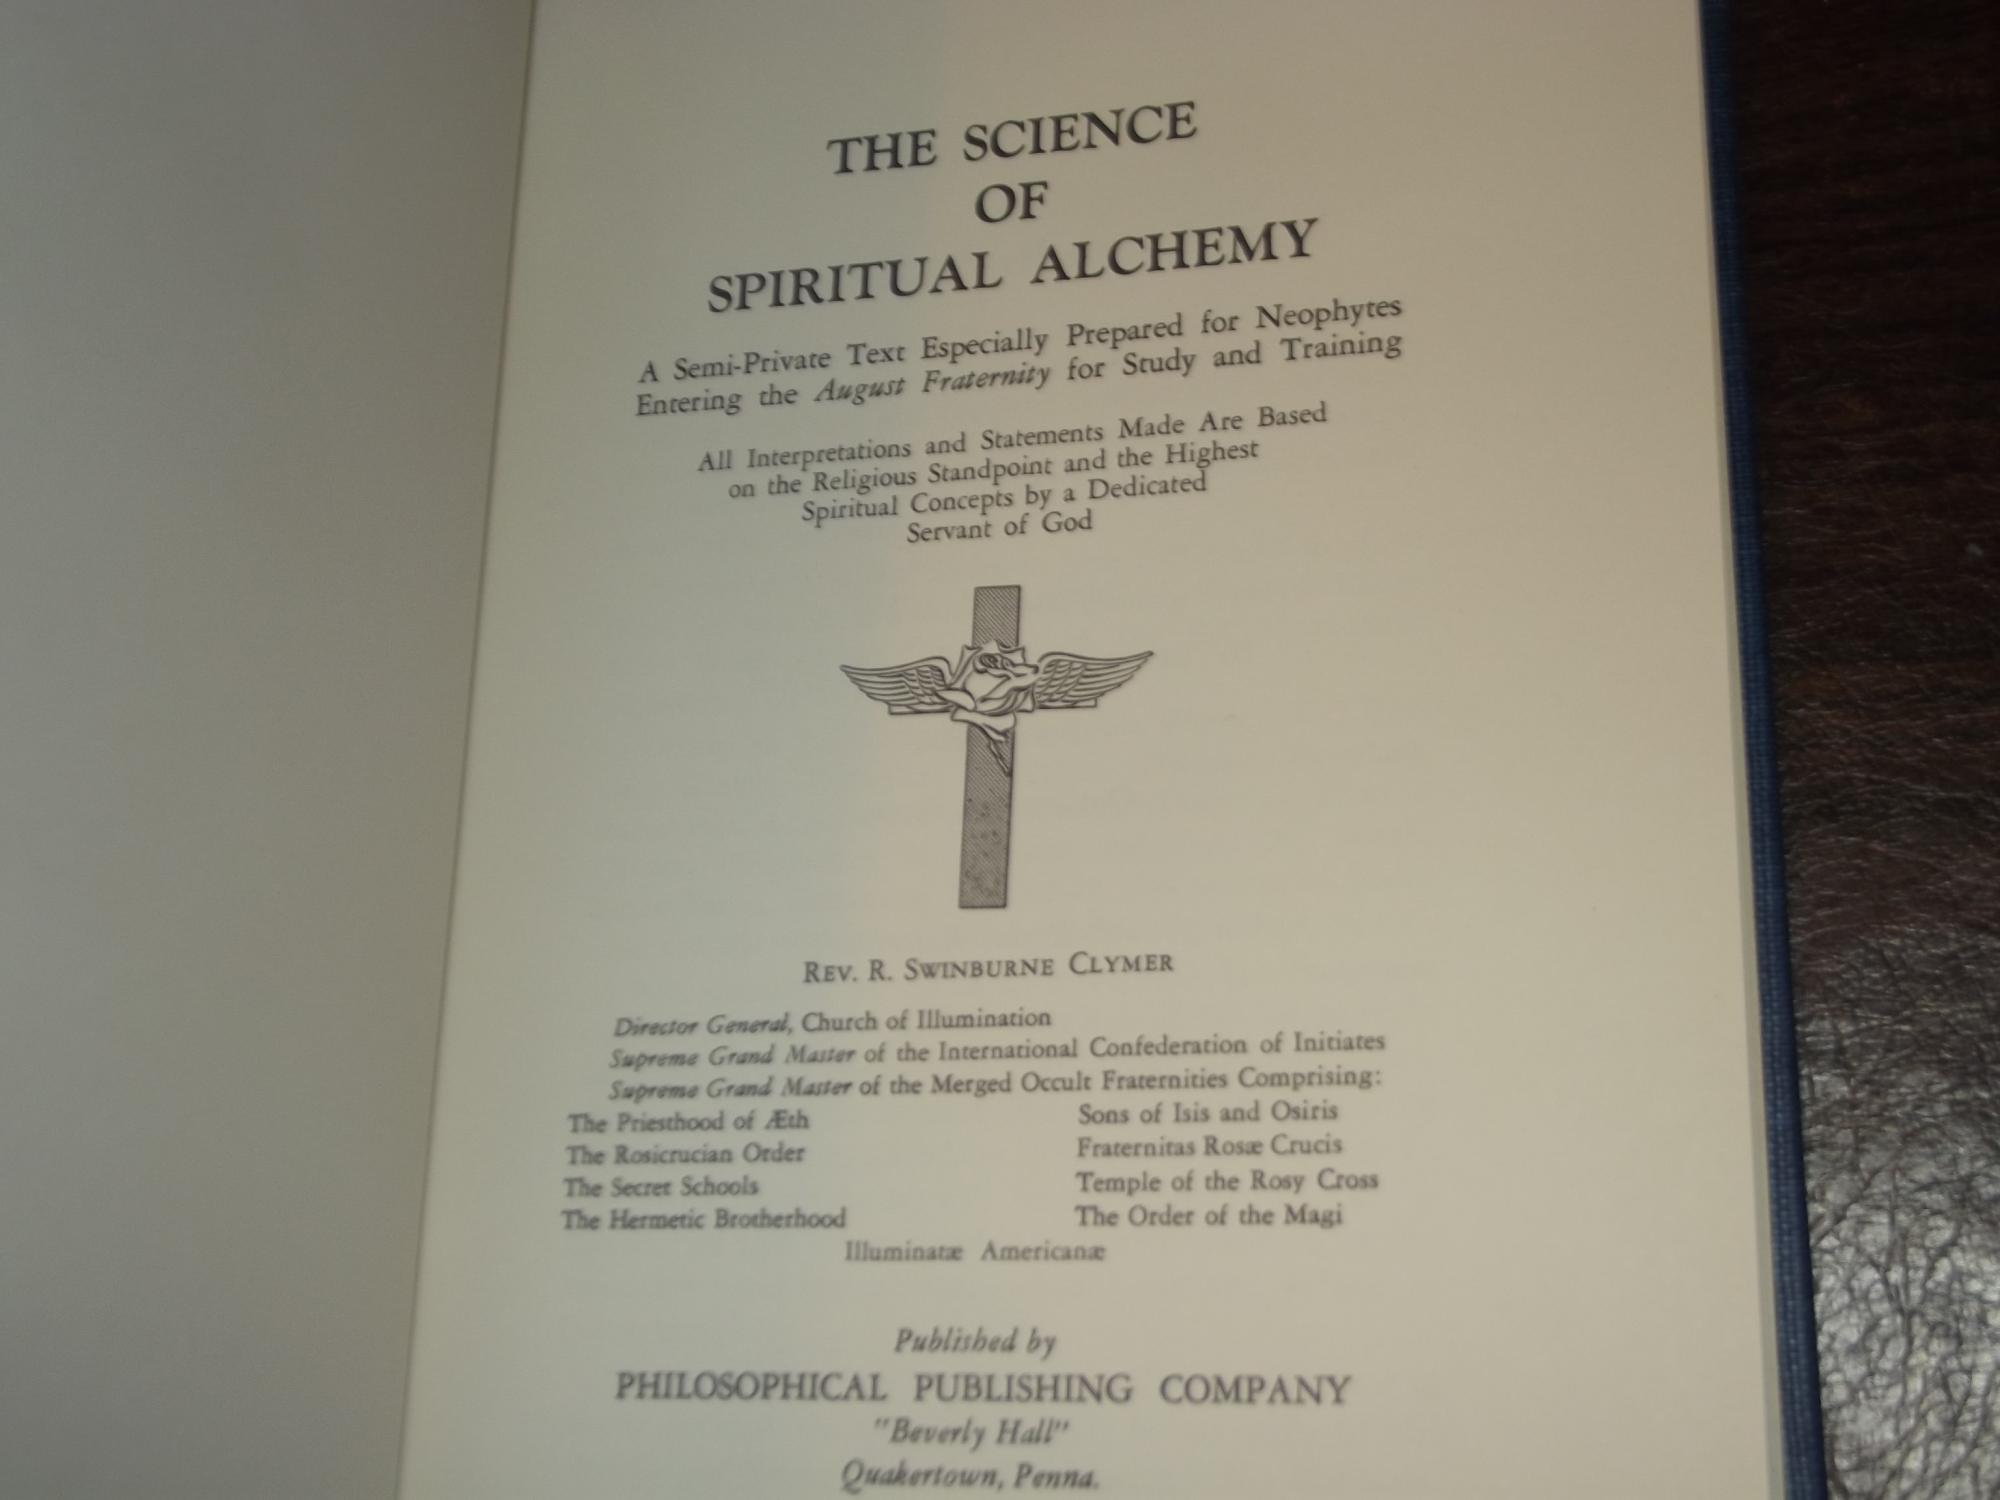 The Science of Spiritual Alchemy